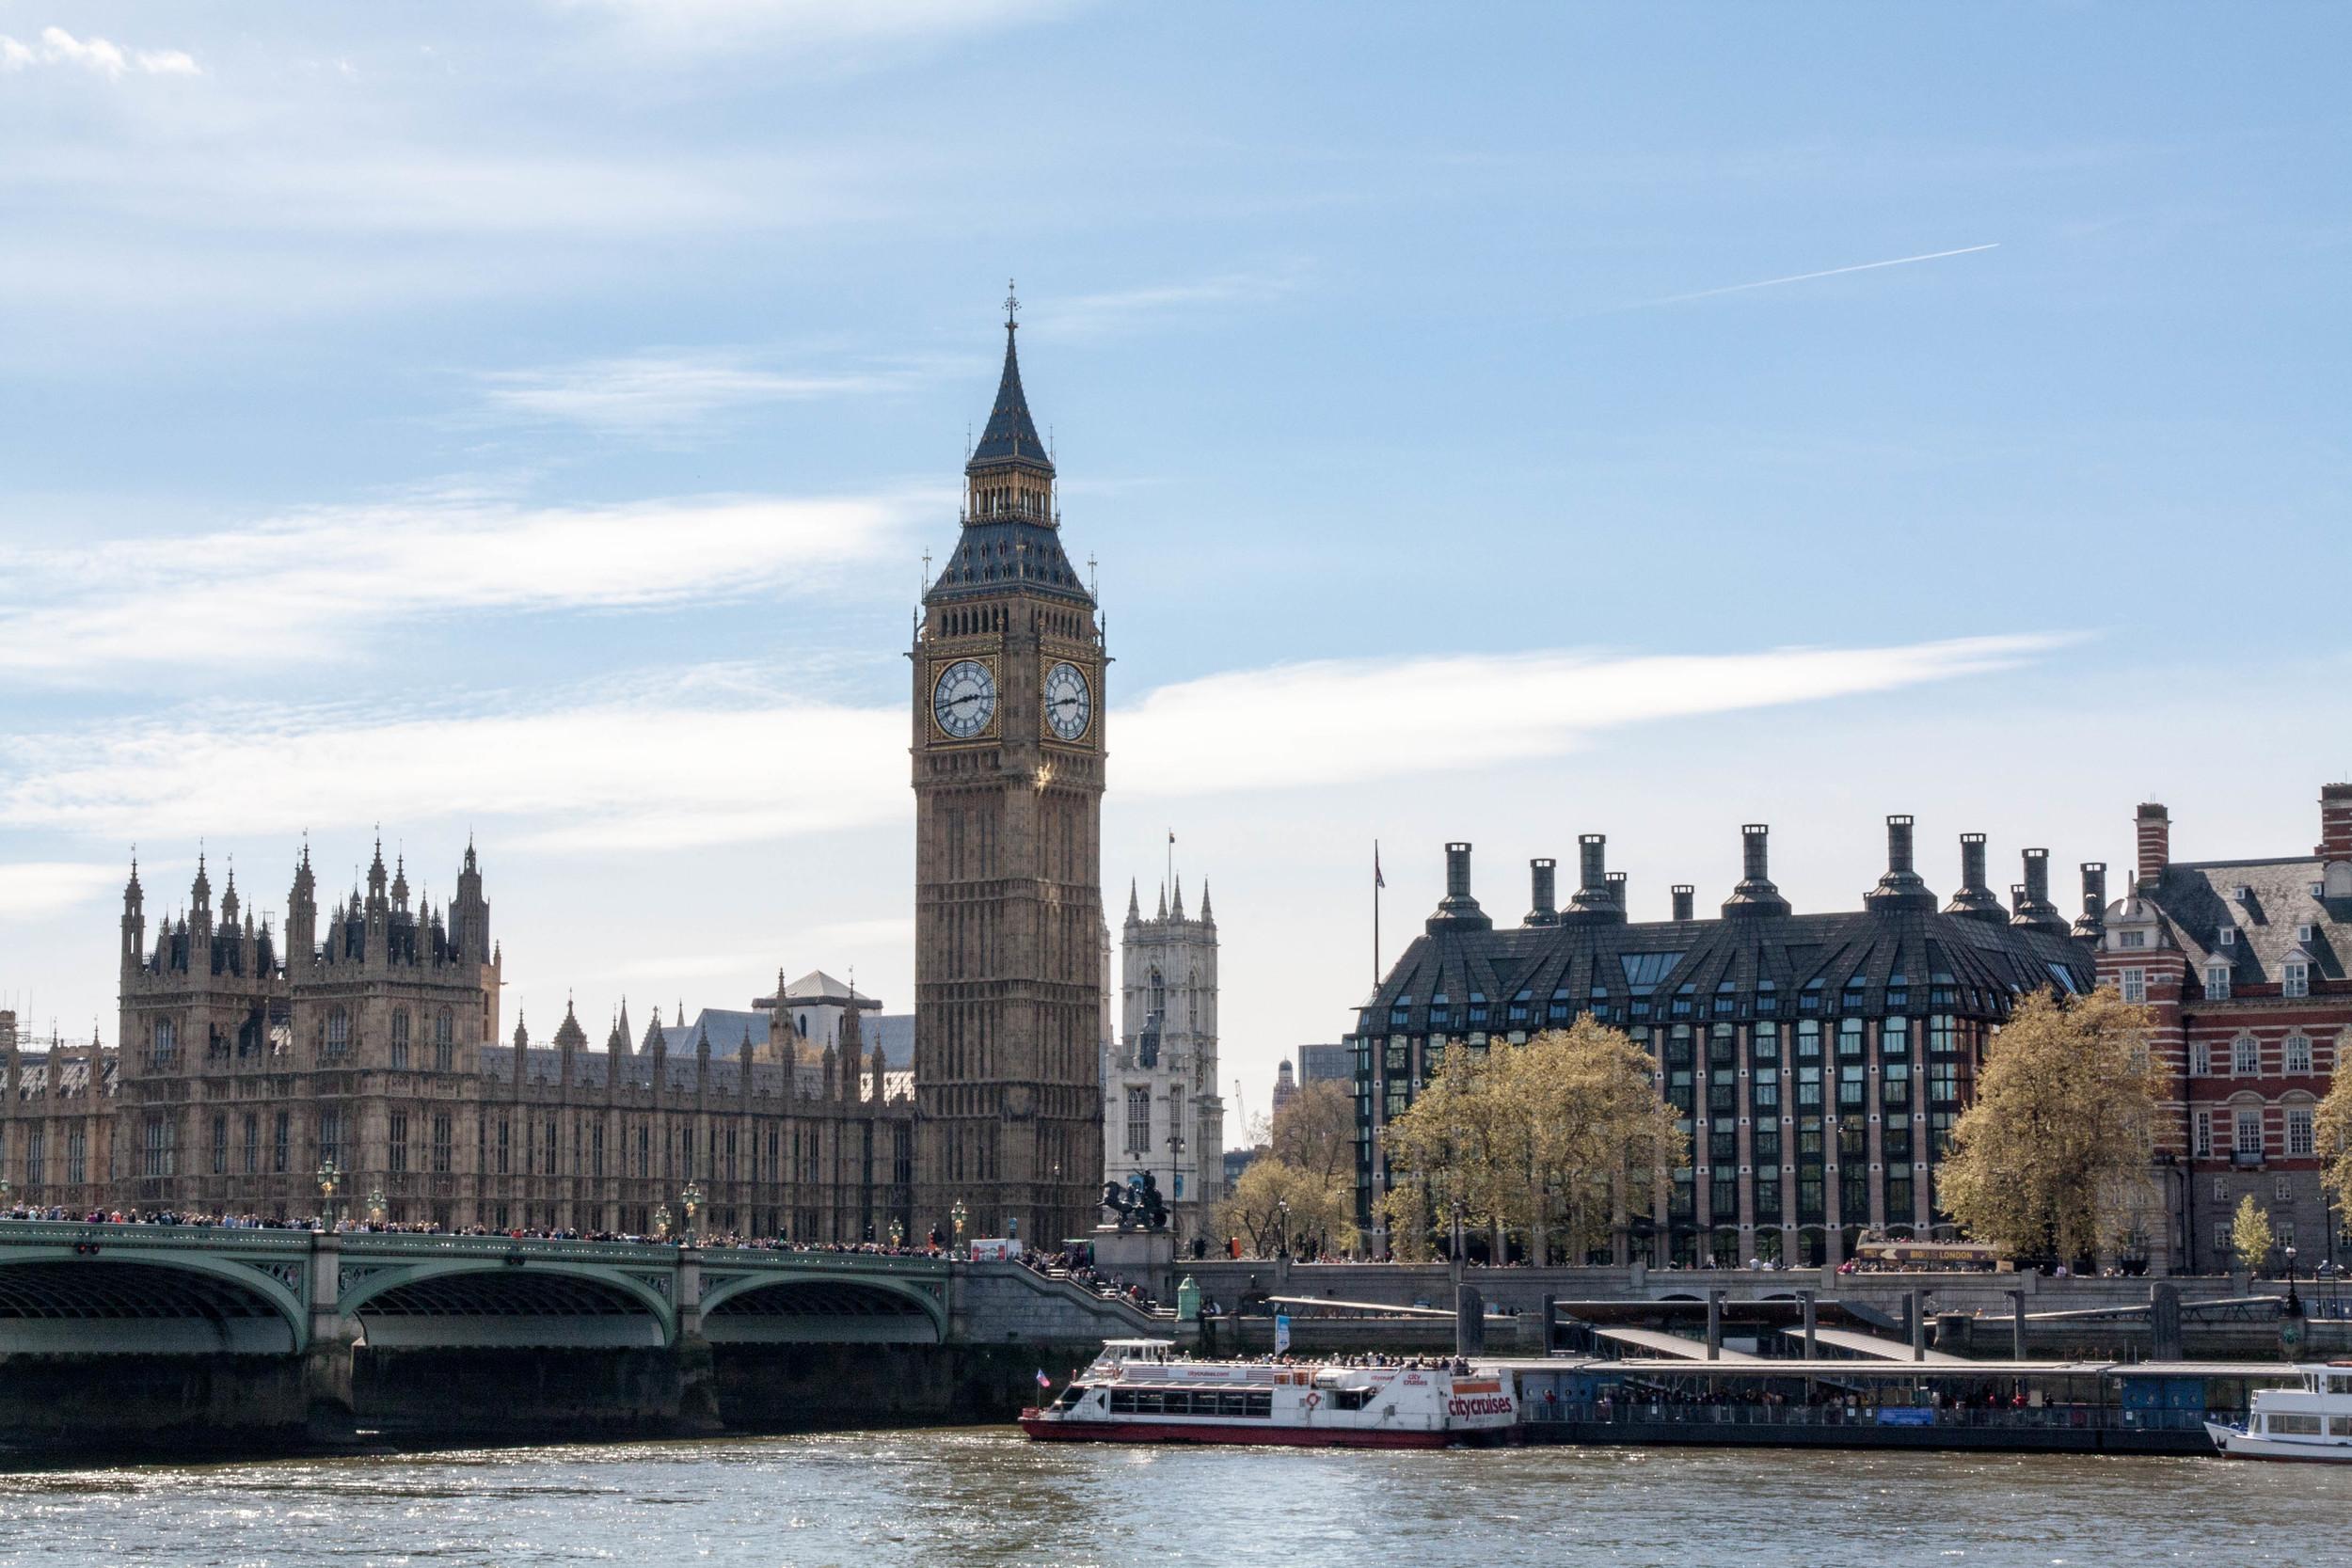 Big Ben across the Thames